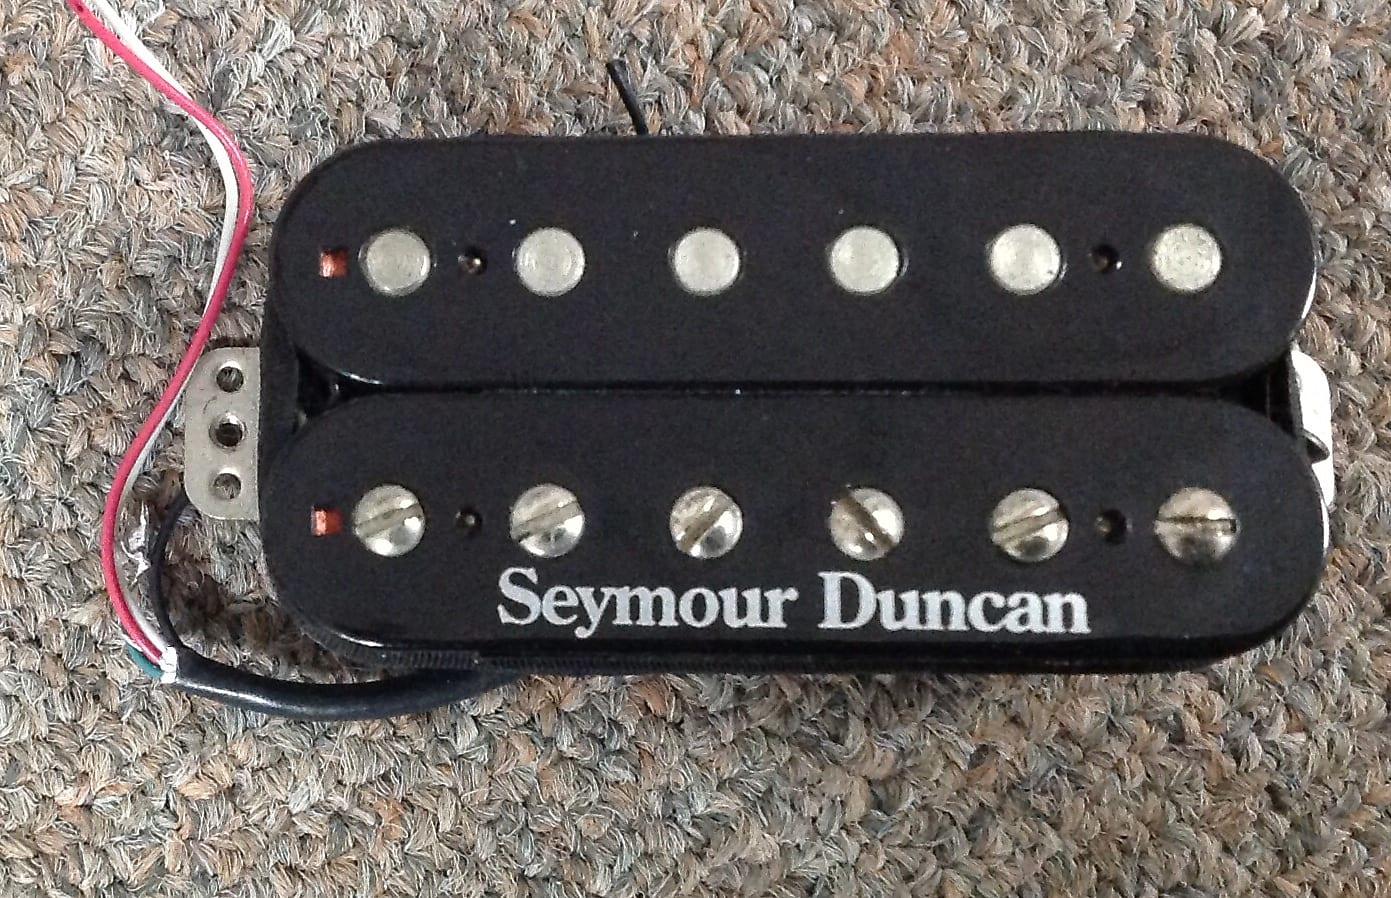 Seymour Duncan TB-4, trembucker JB model